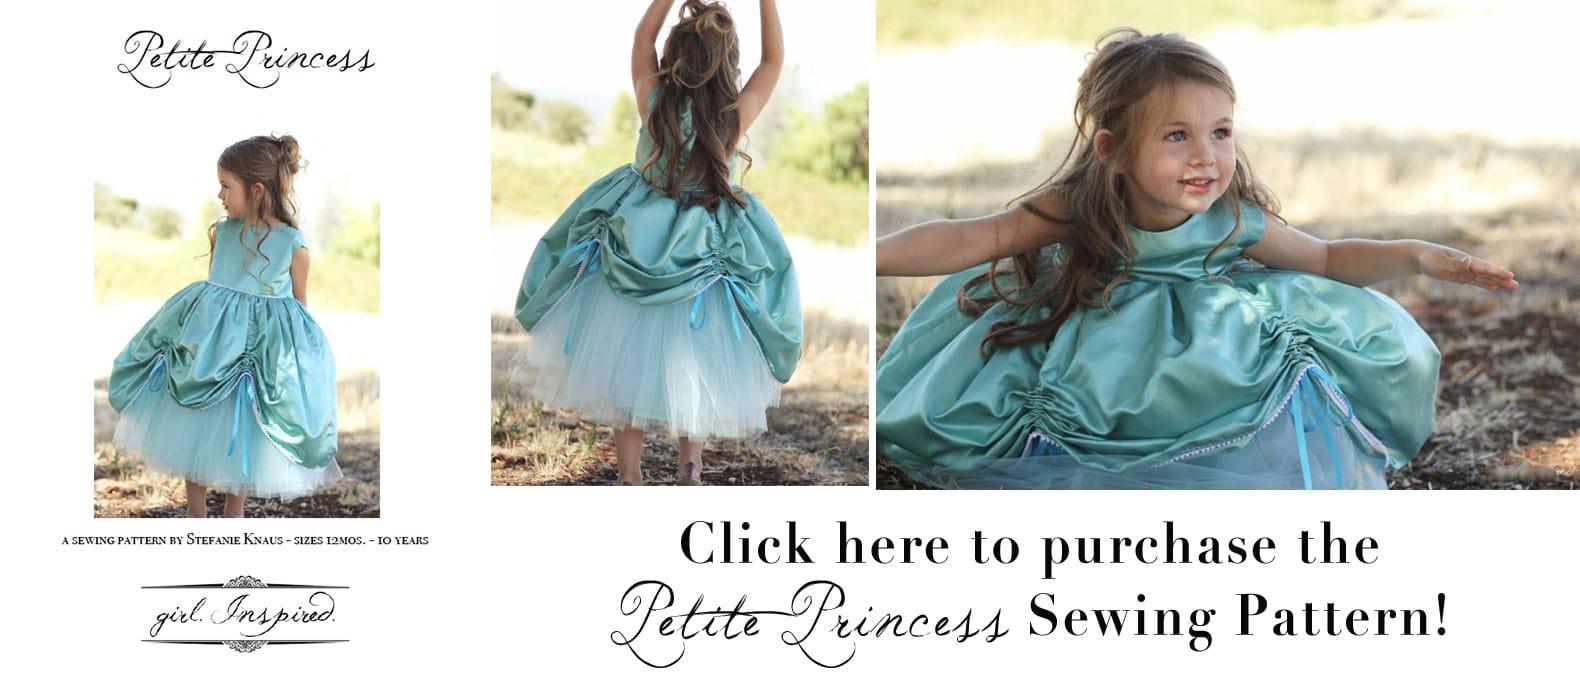 petite-princess-click-here